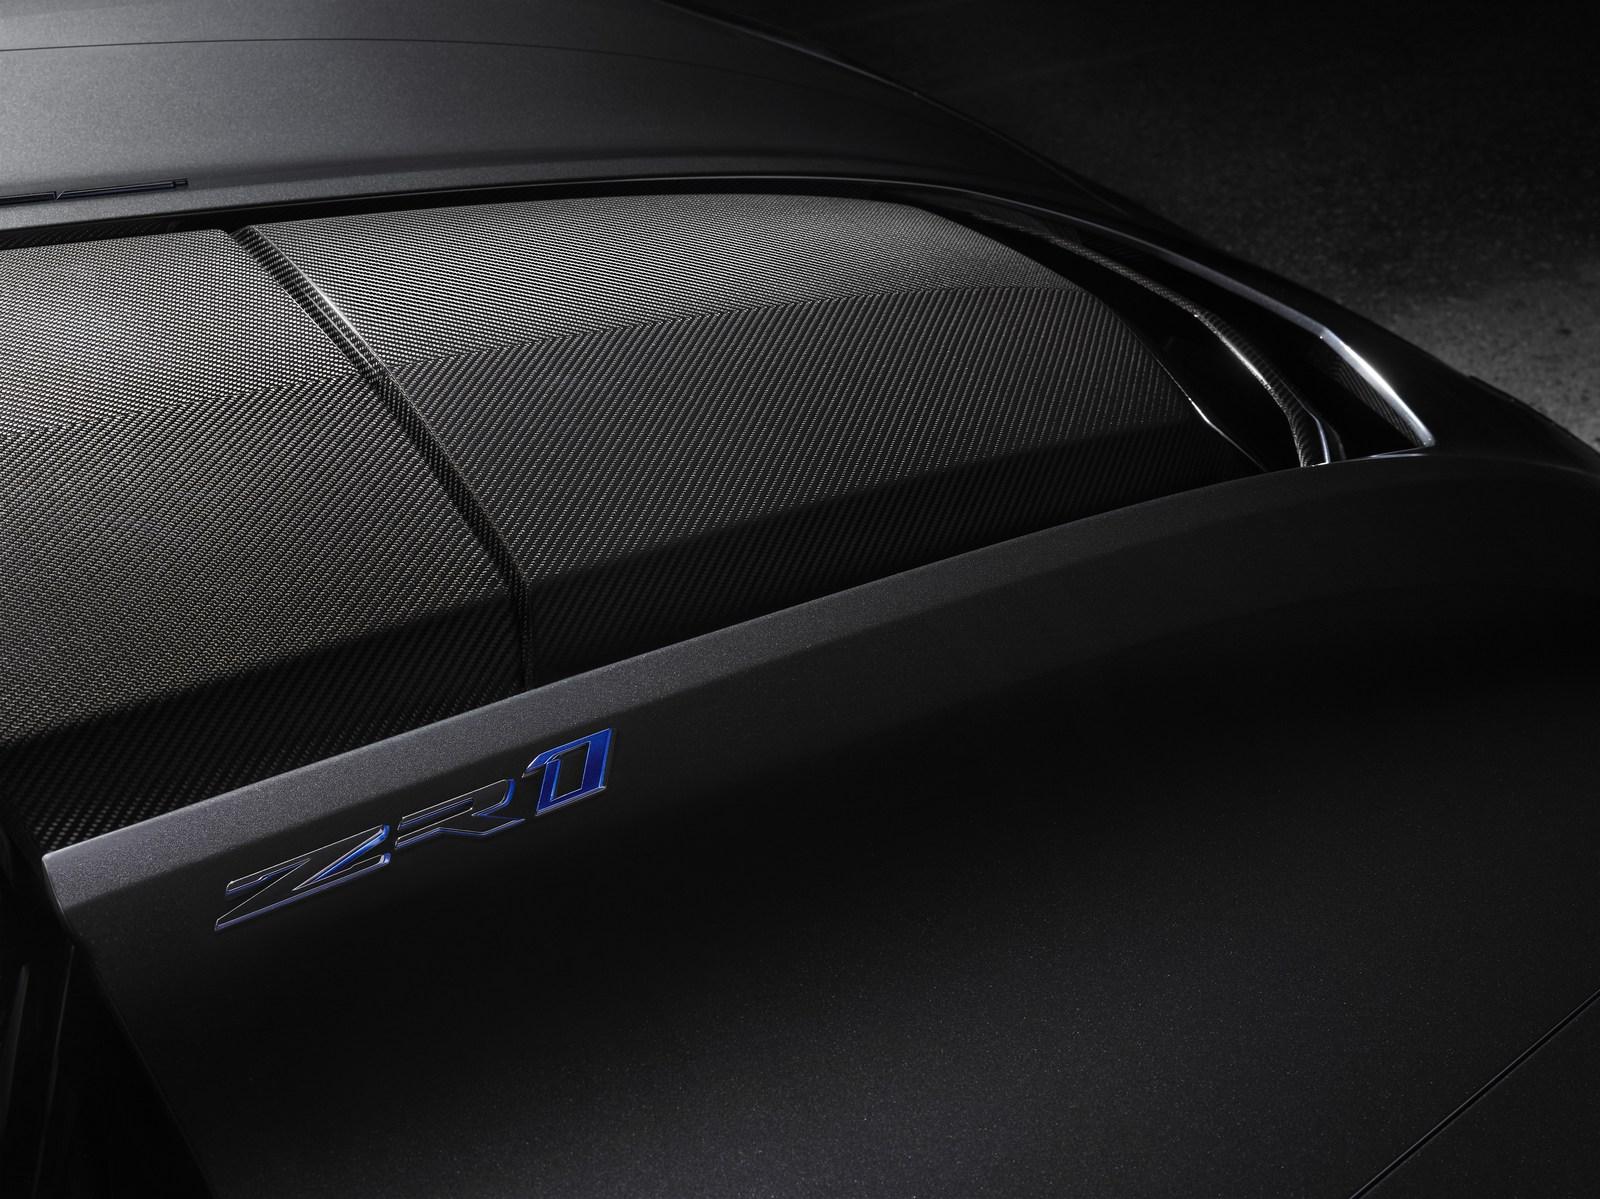 Chevrolet Recalls Corvette ZR1 Over Software Issue